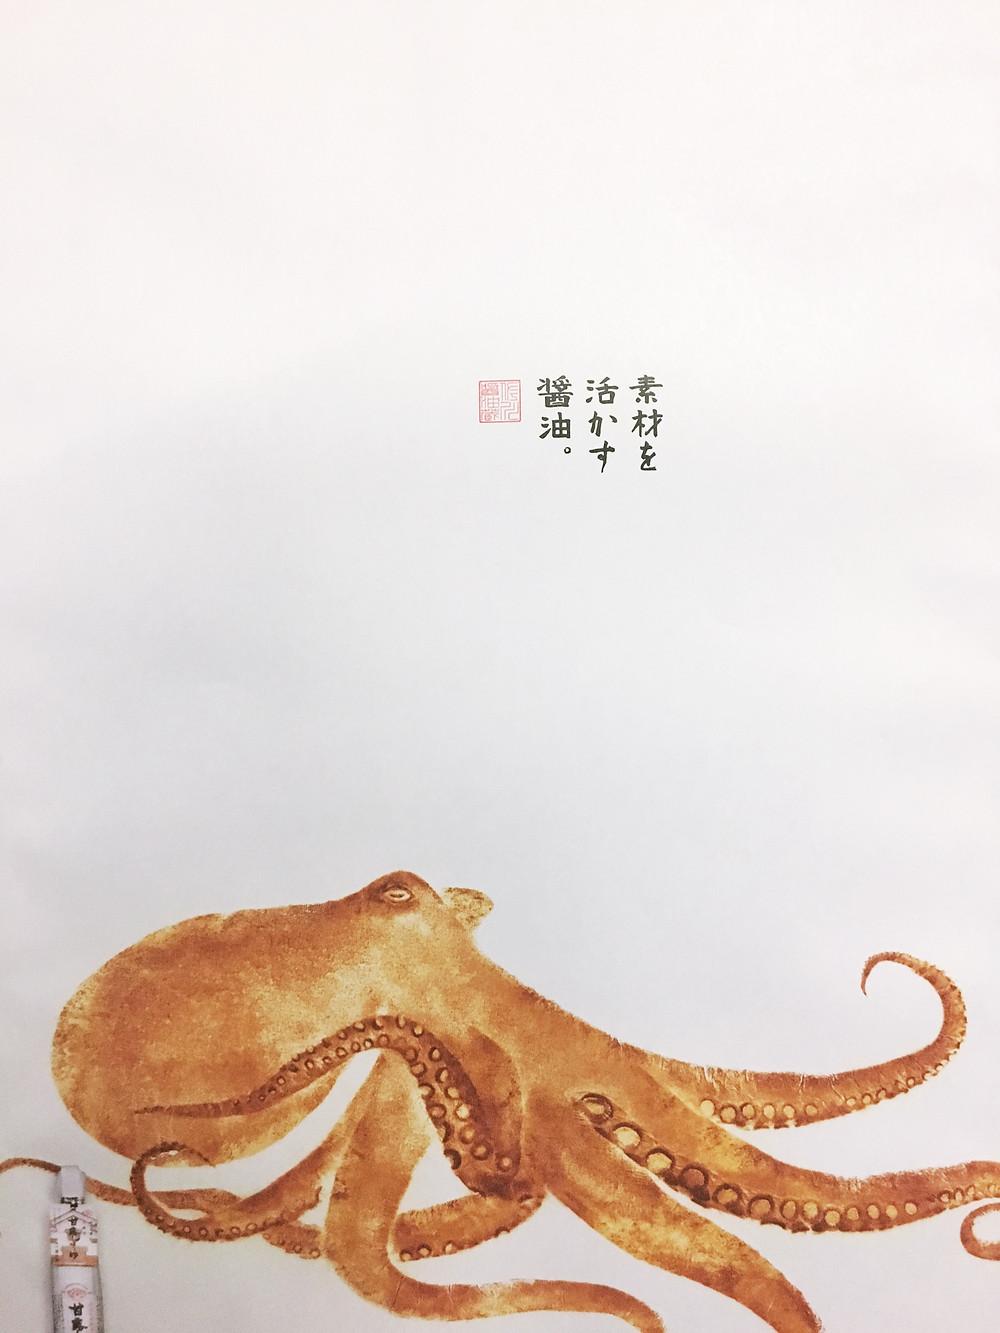 Soy Sauce ad for Sagawa Shoyu Inc. D&AD 2018